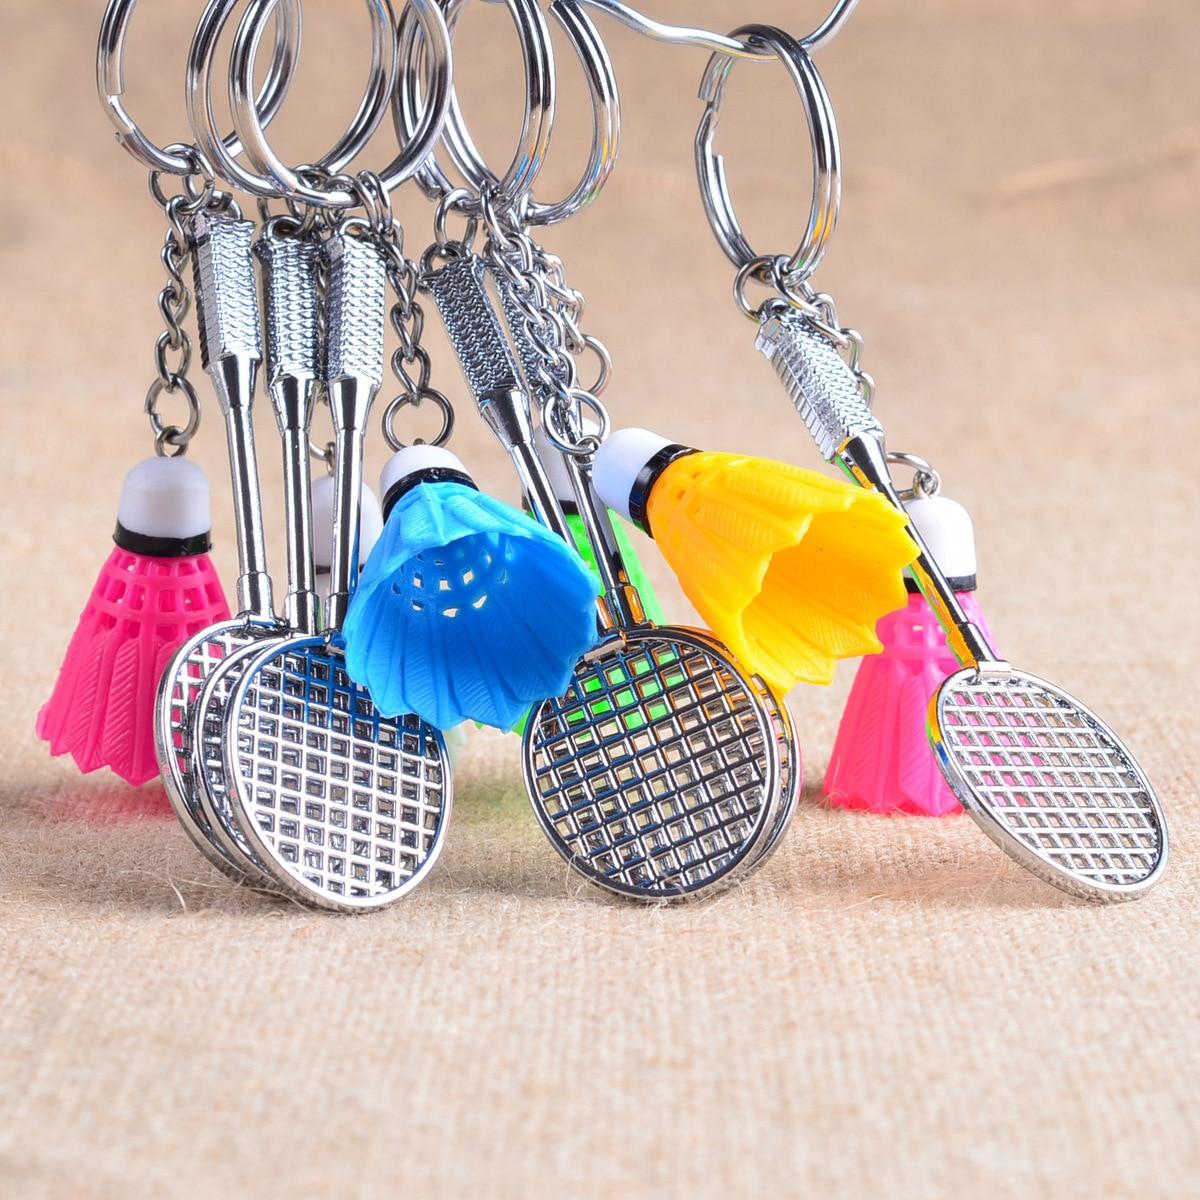 Mini Metal Badminton Racket Key Ring Souvenir Cute Badminton Racquet Ball Key-chain Sports Chain Gift 5 Colors L753